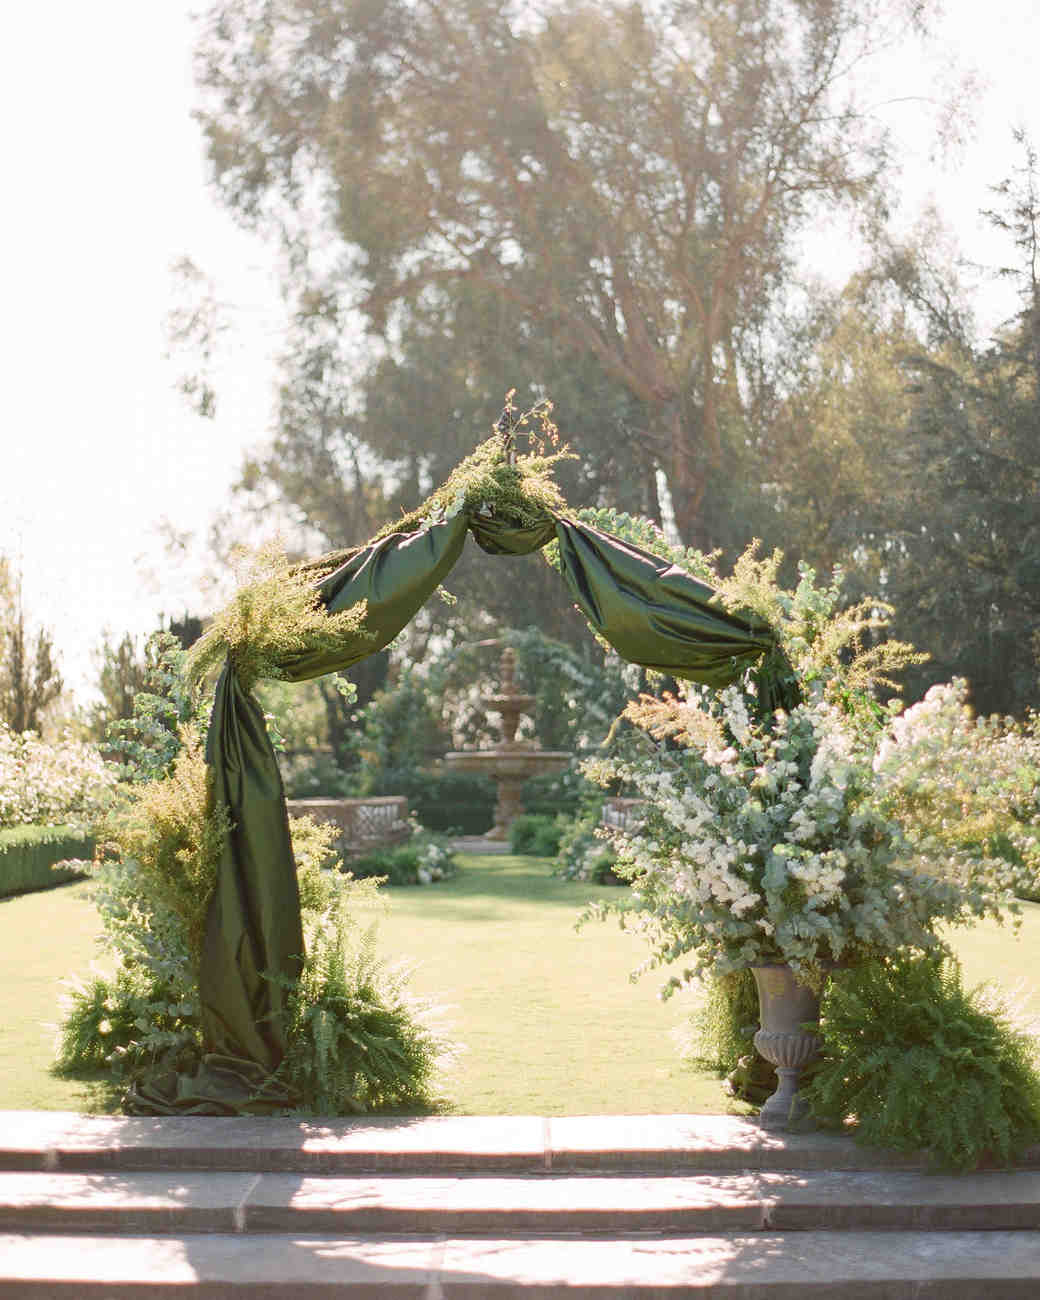 lily-jonathan-wedding-california-66110001-s112482.jpg